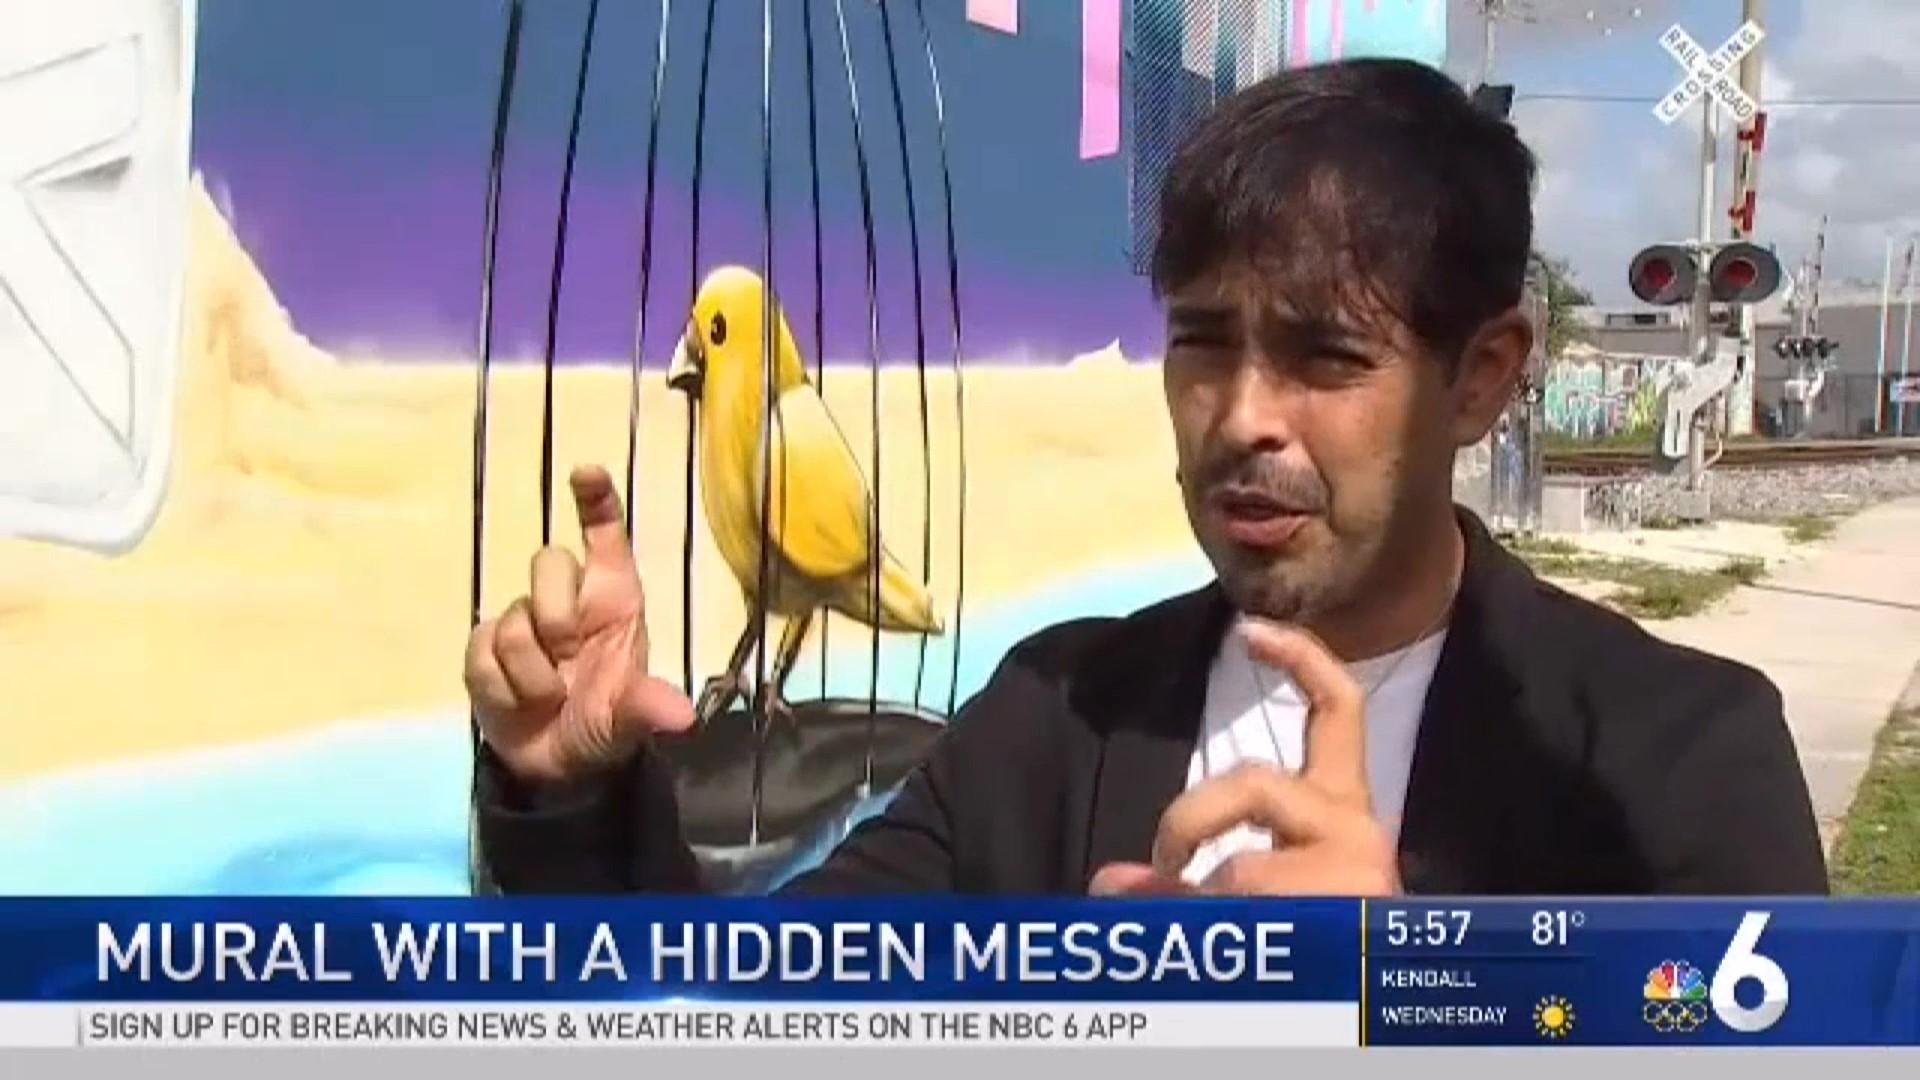 NBC 6 news - Explaining the marker based AR experience.